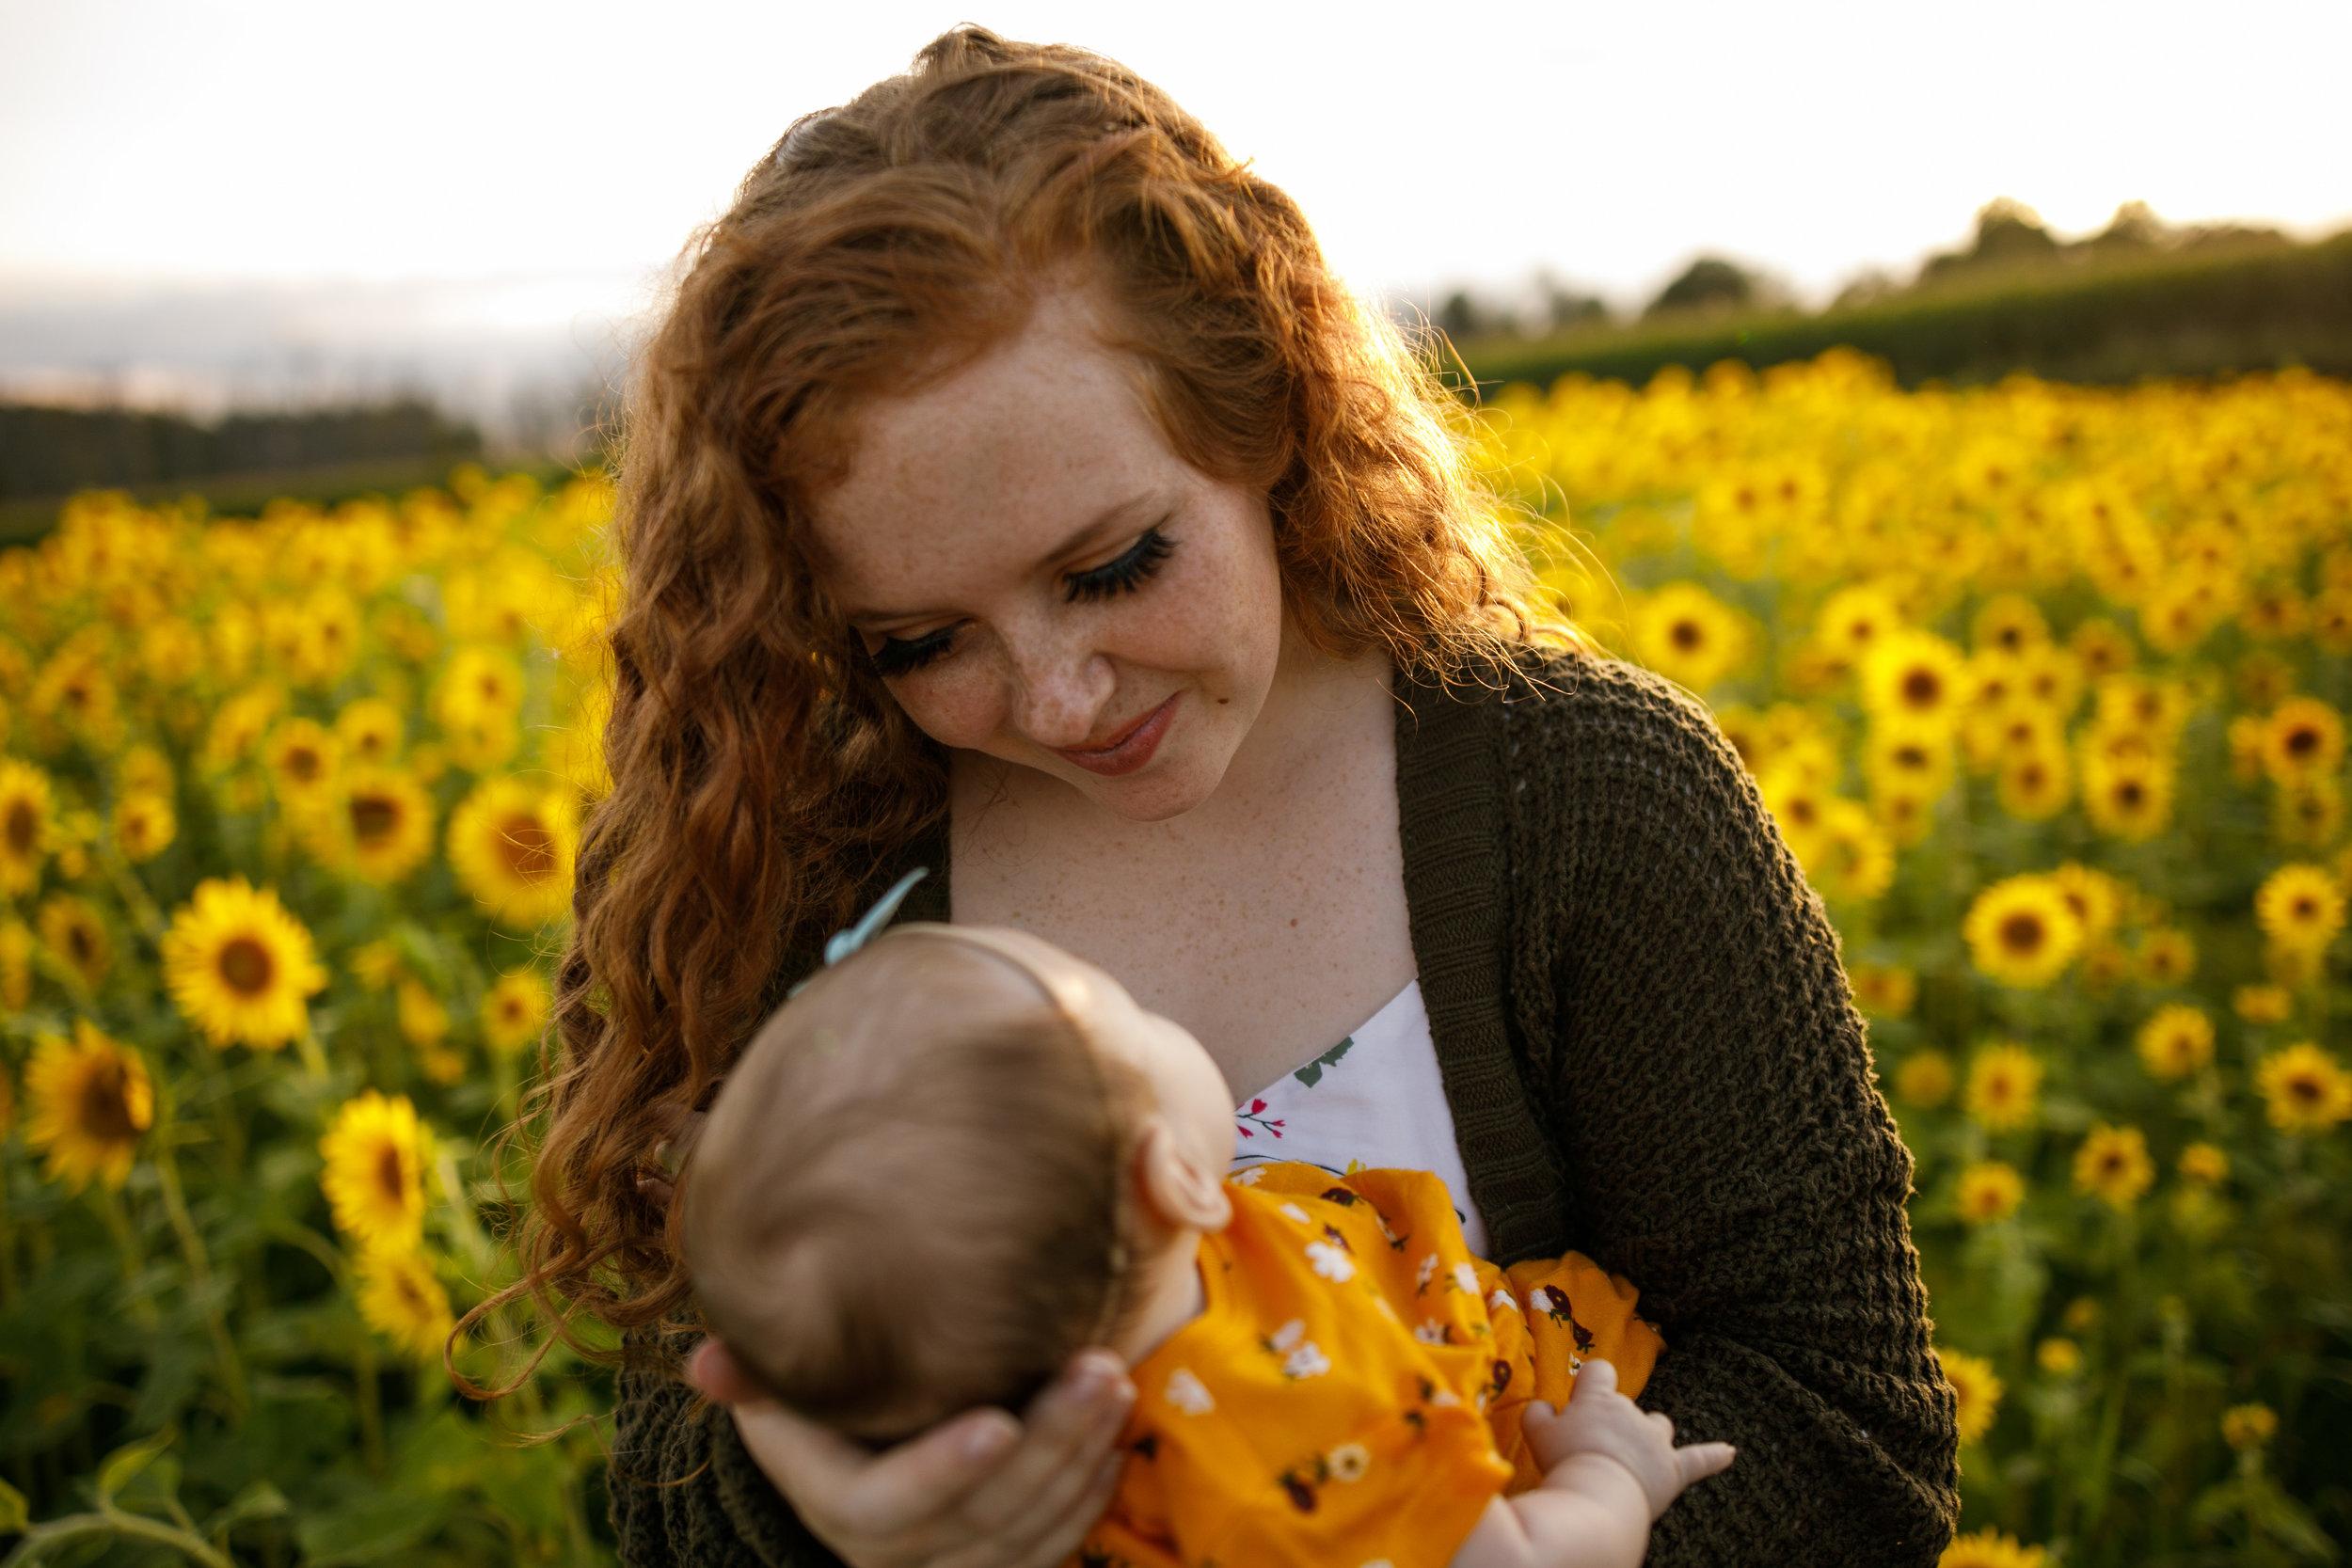 Morris Family Summer 2019 - Grand Rapids Photographer - Grand Rapids Family Photographer - Ed Dunneback and Girls - J Darling Photo 020.jpg